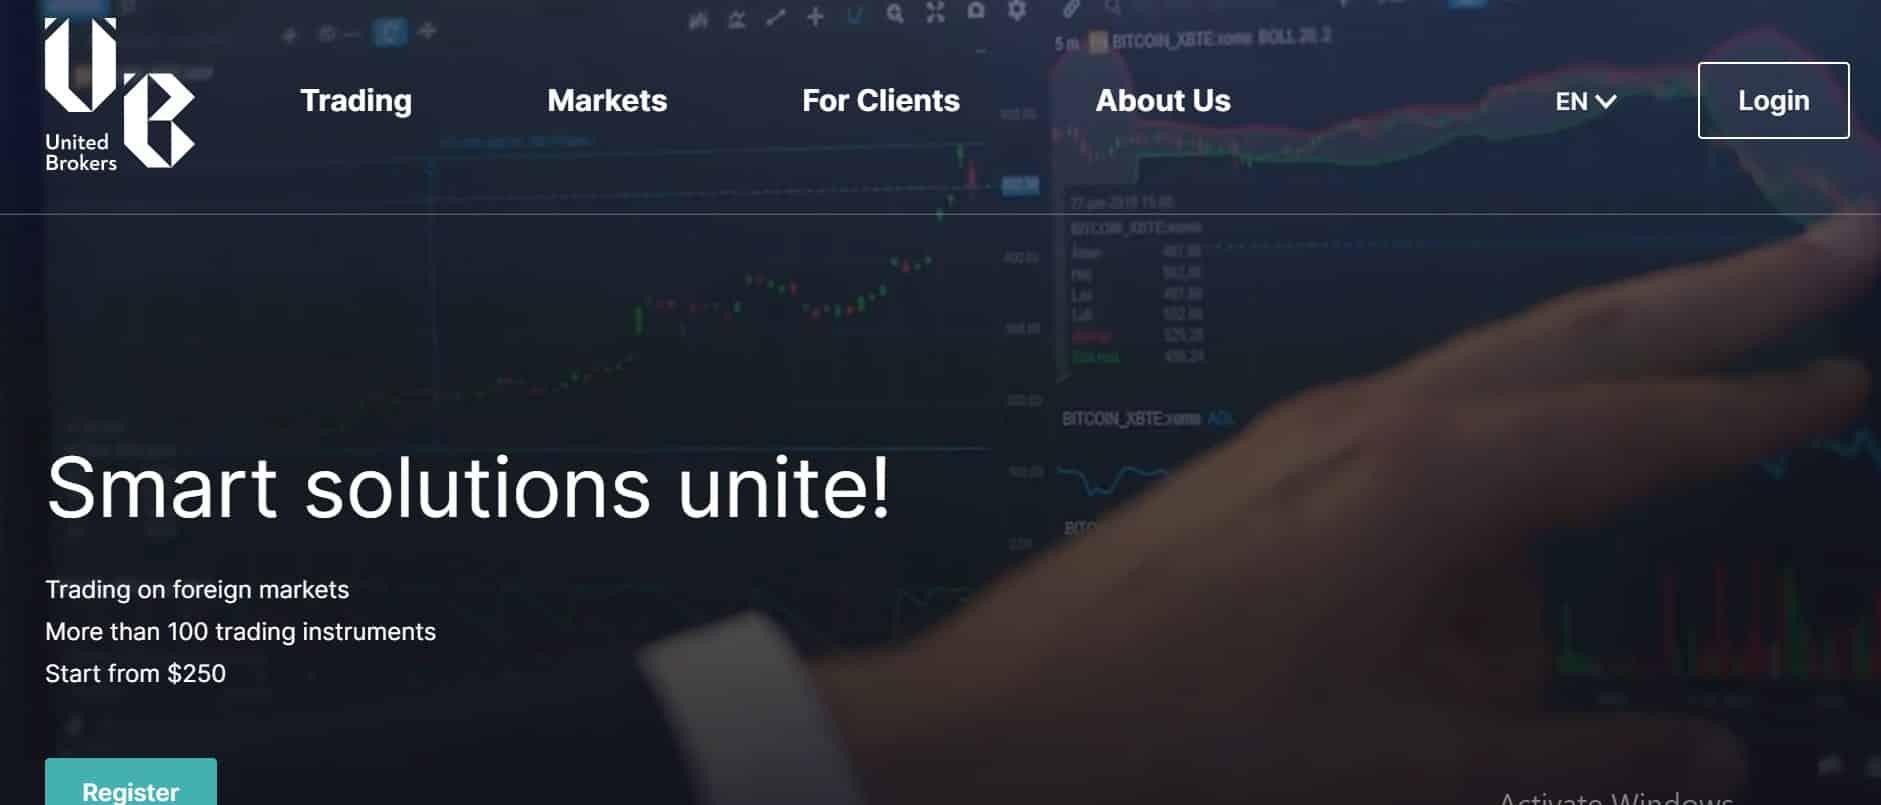 UnitedBrokers website